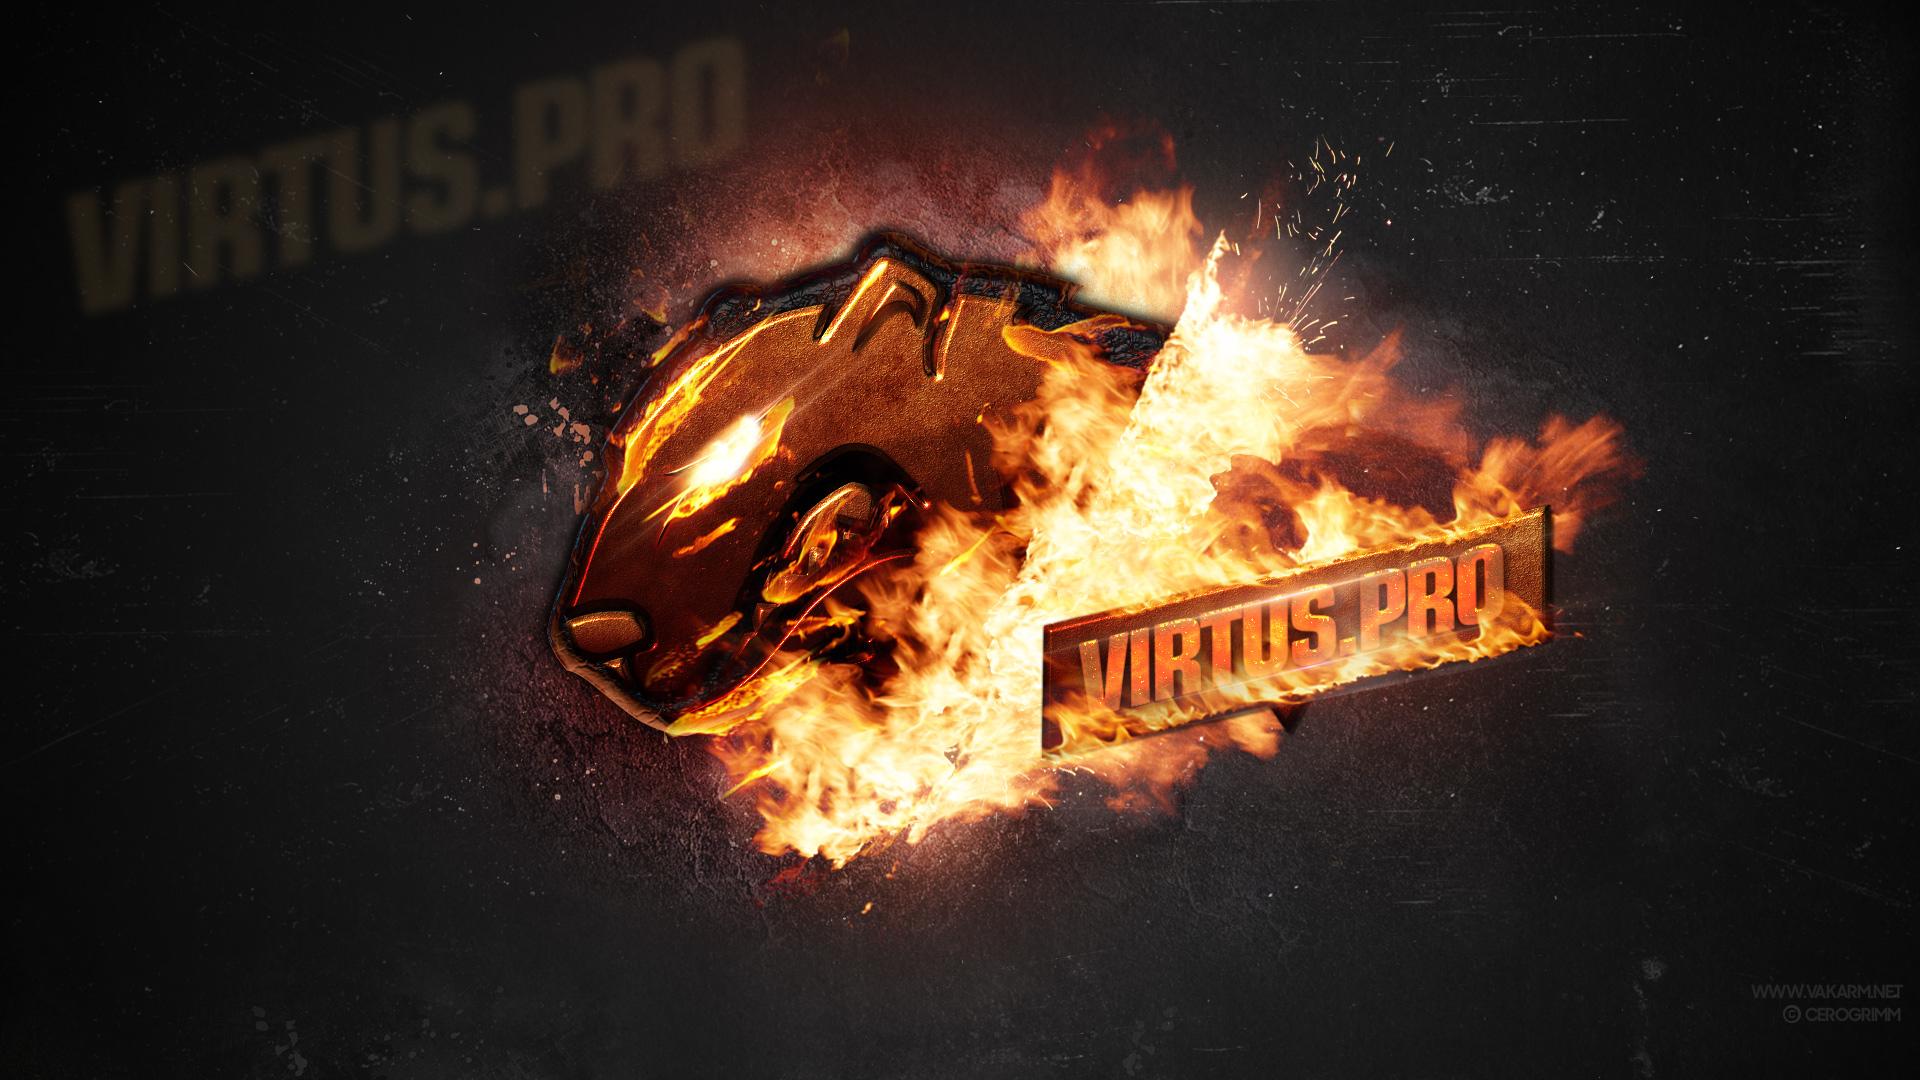 Virtus.pro